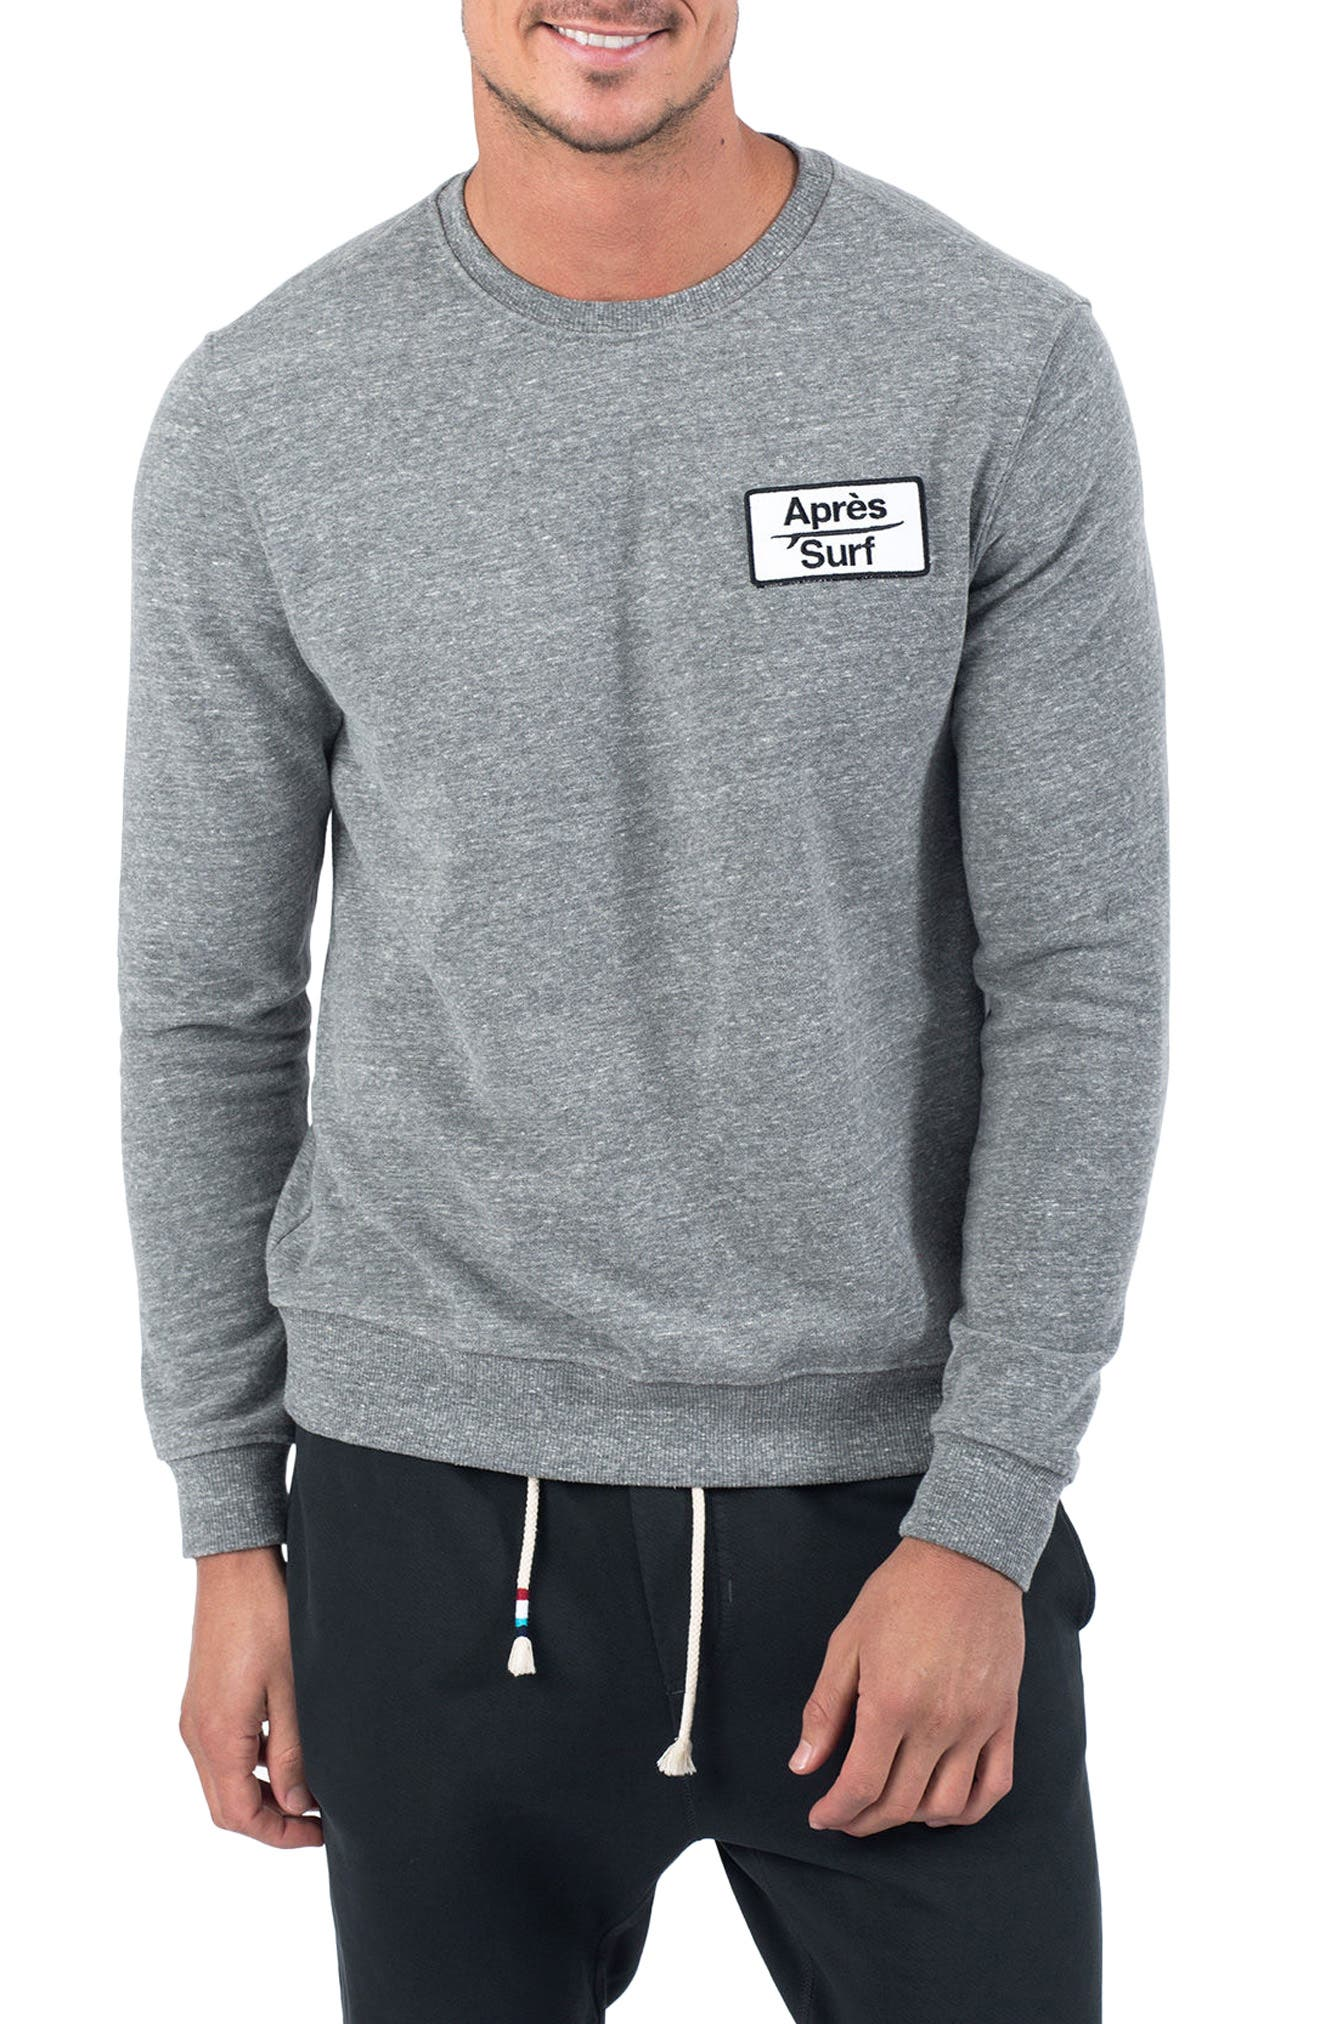 Aprés Surf Sweatshirt,                         Main,                         color, Heather Grey